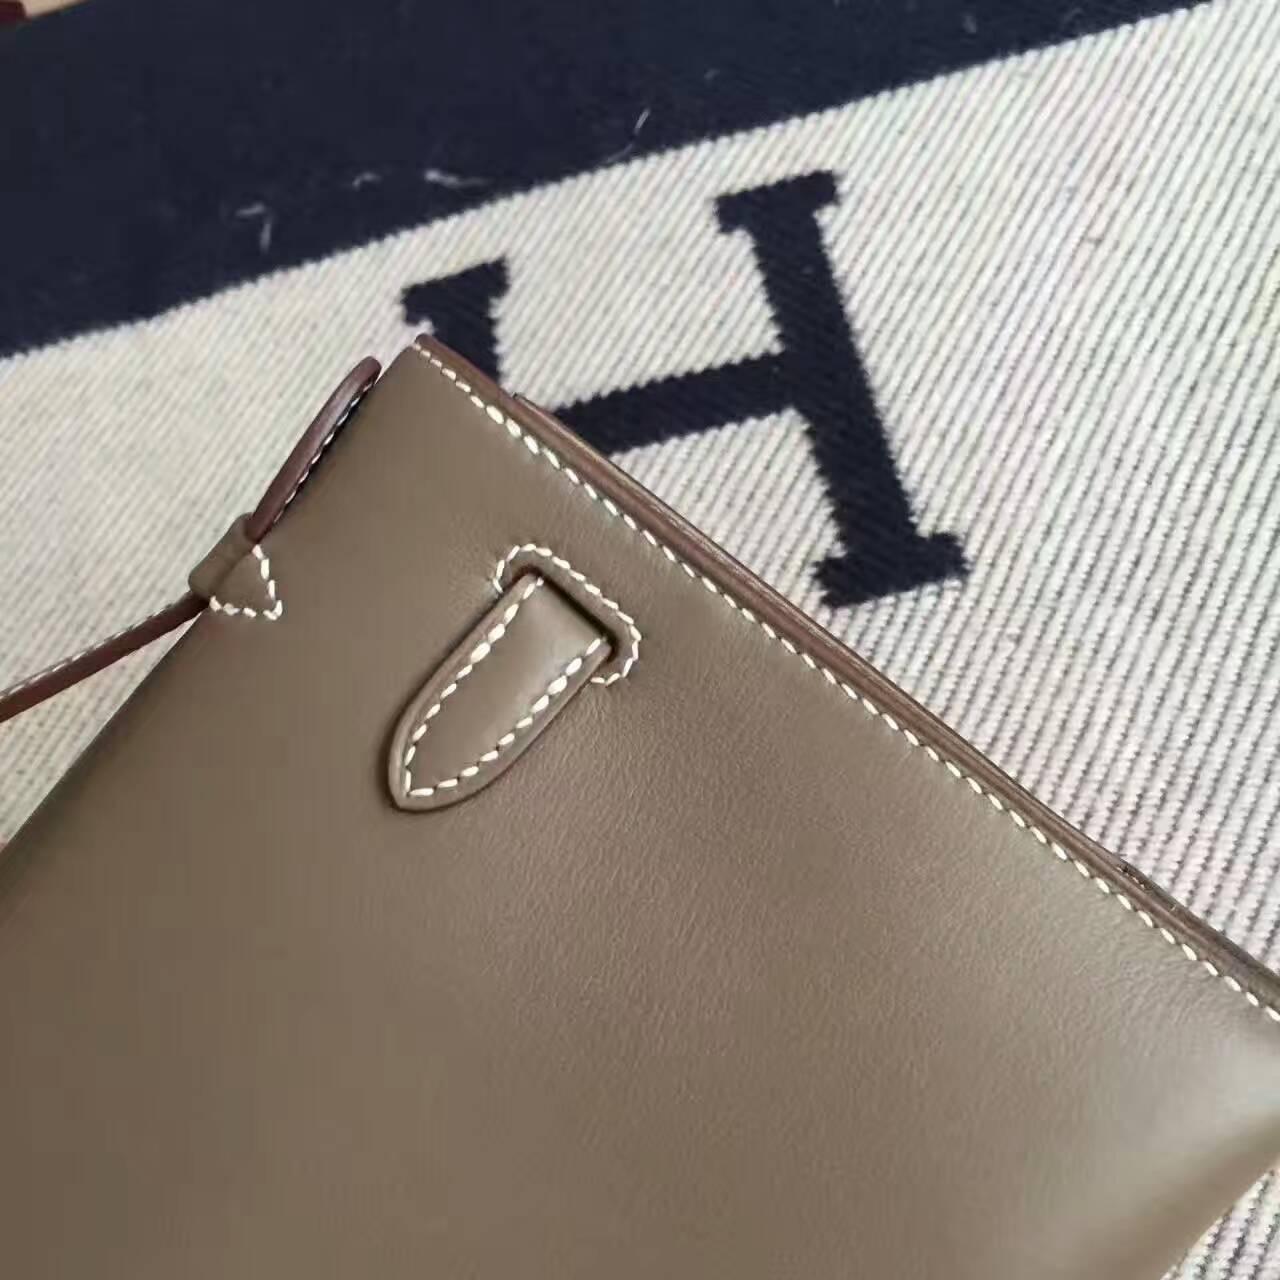 High Quality Hermes CK18 Etoupe Grey Swift Leather Minikelly Pochette 22CM